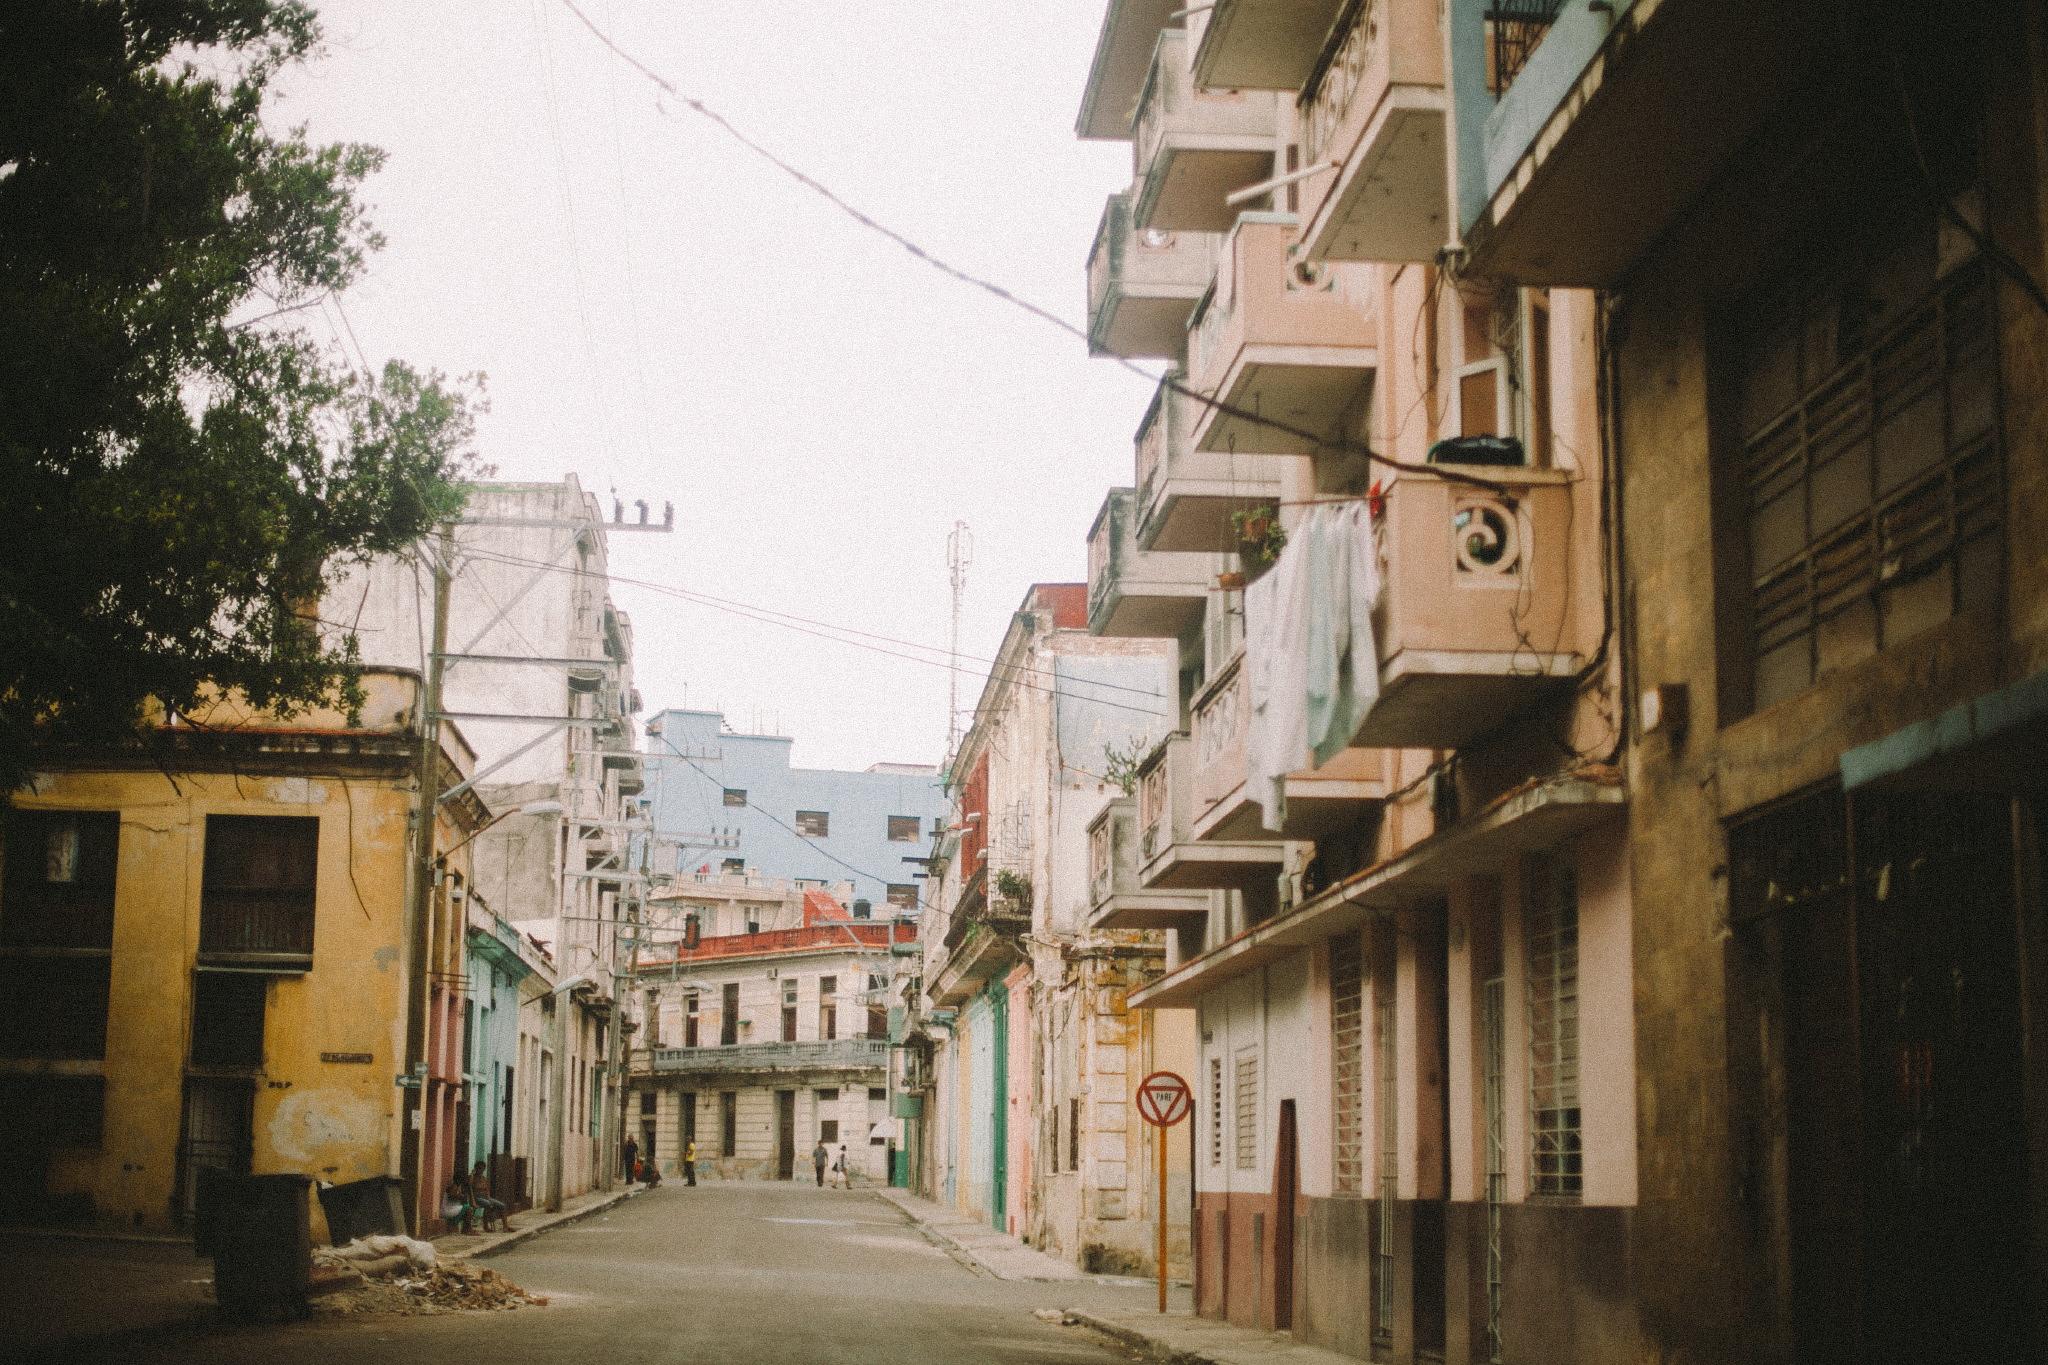 san diego wedding   photographer | urban residential area in cuba